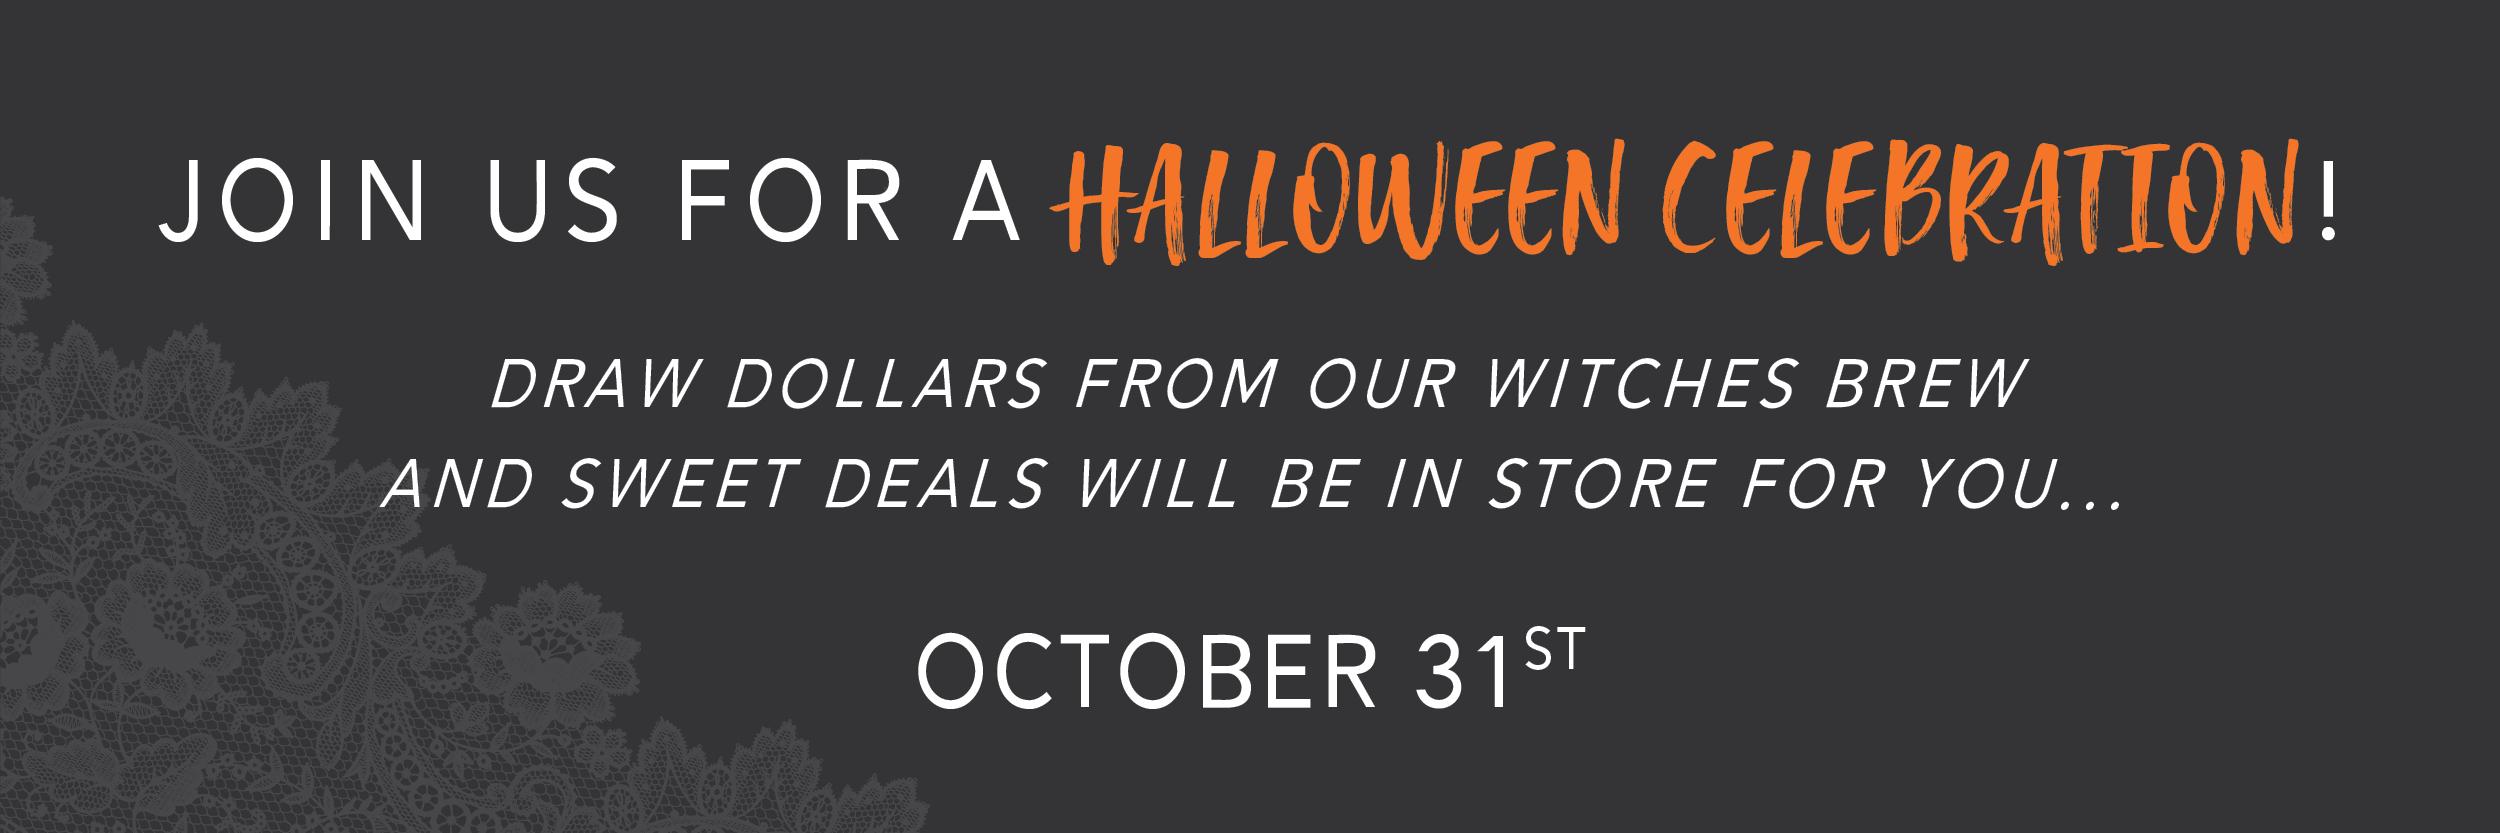 Halloween Celebration Mercantile Portland